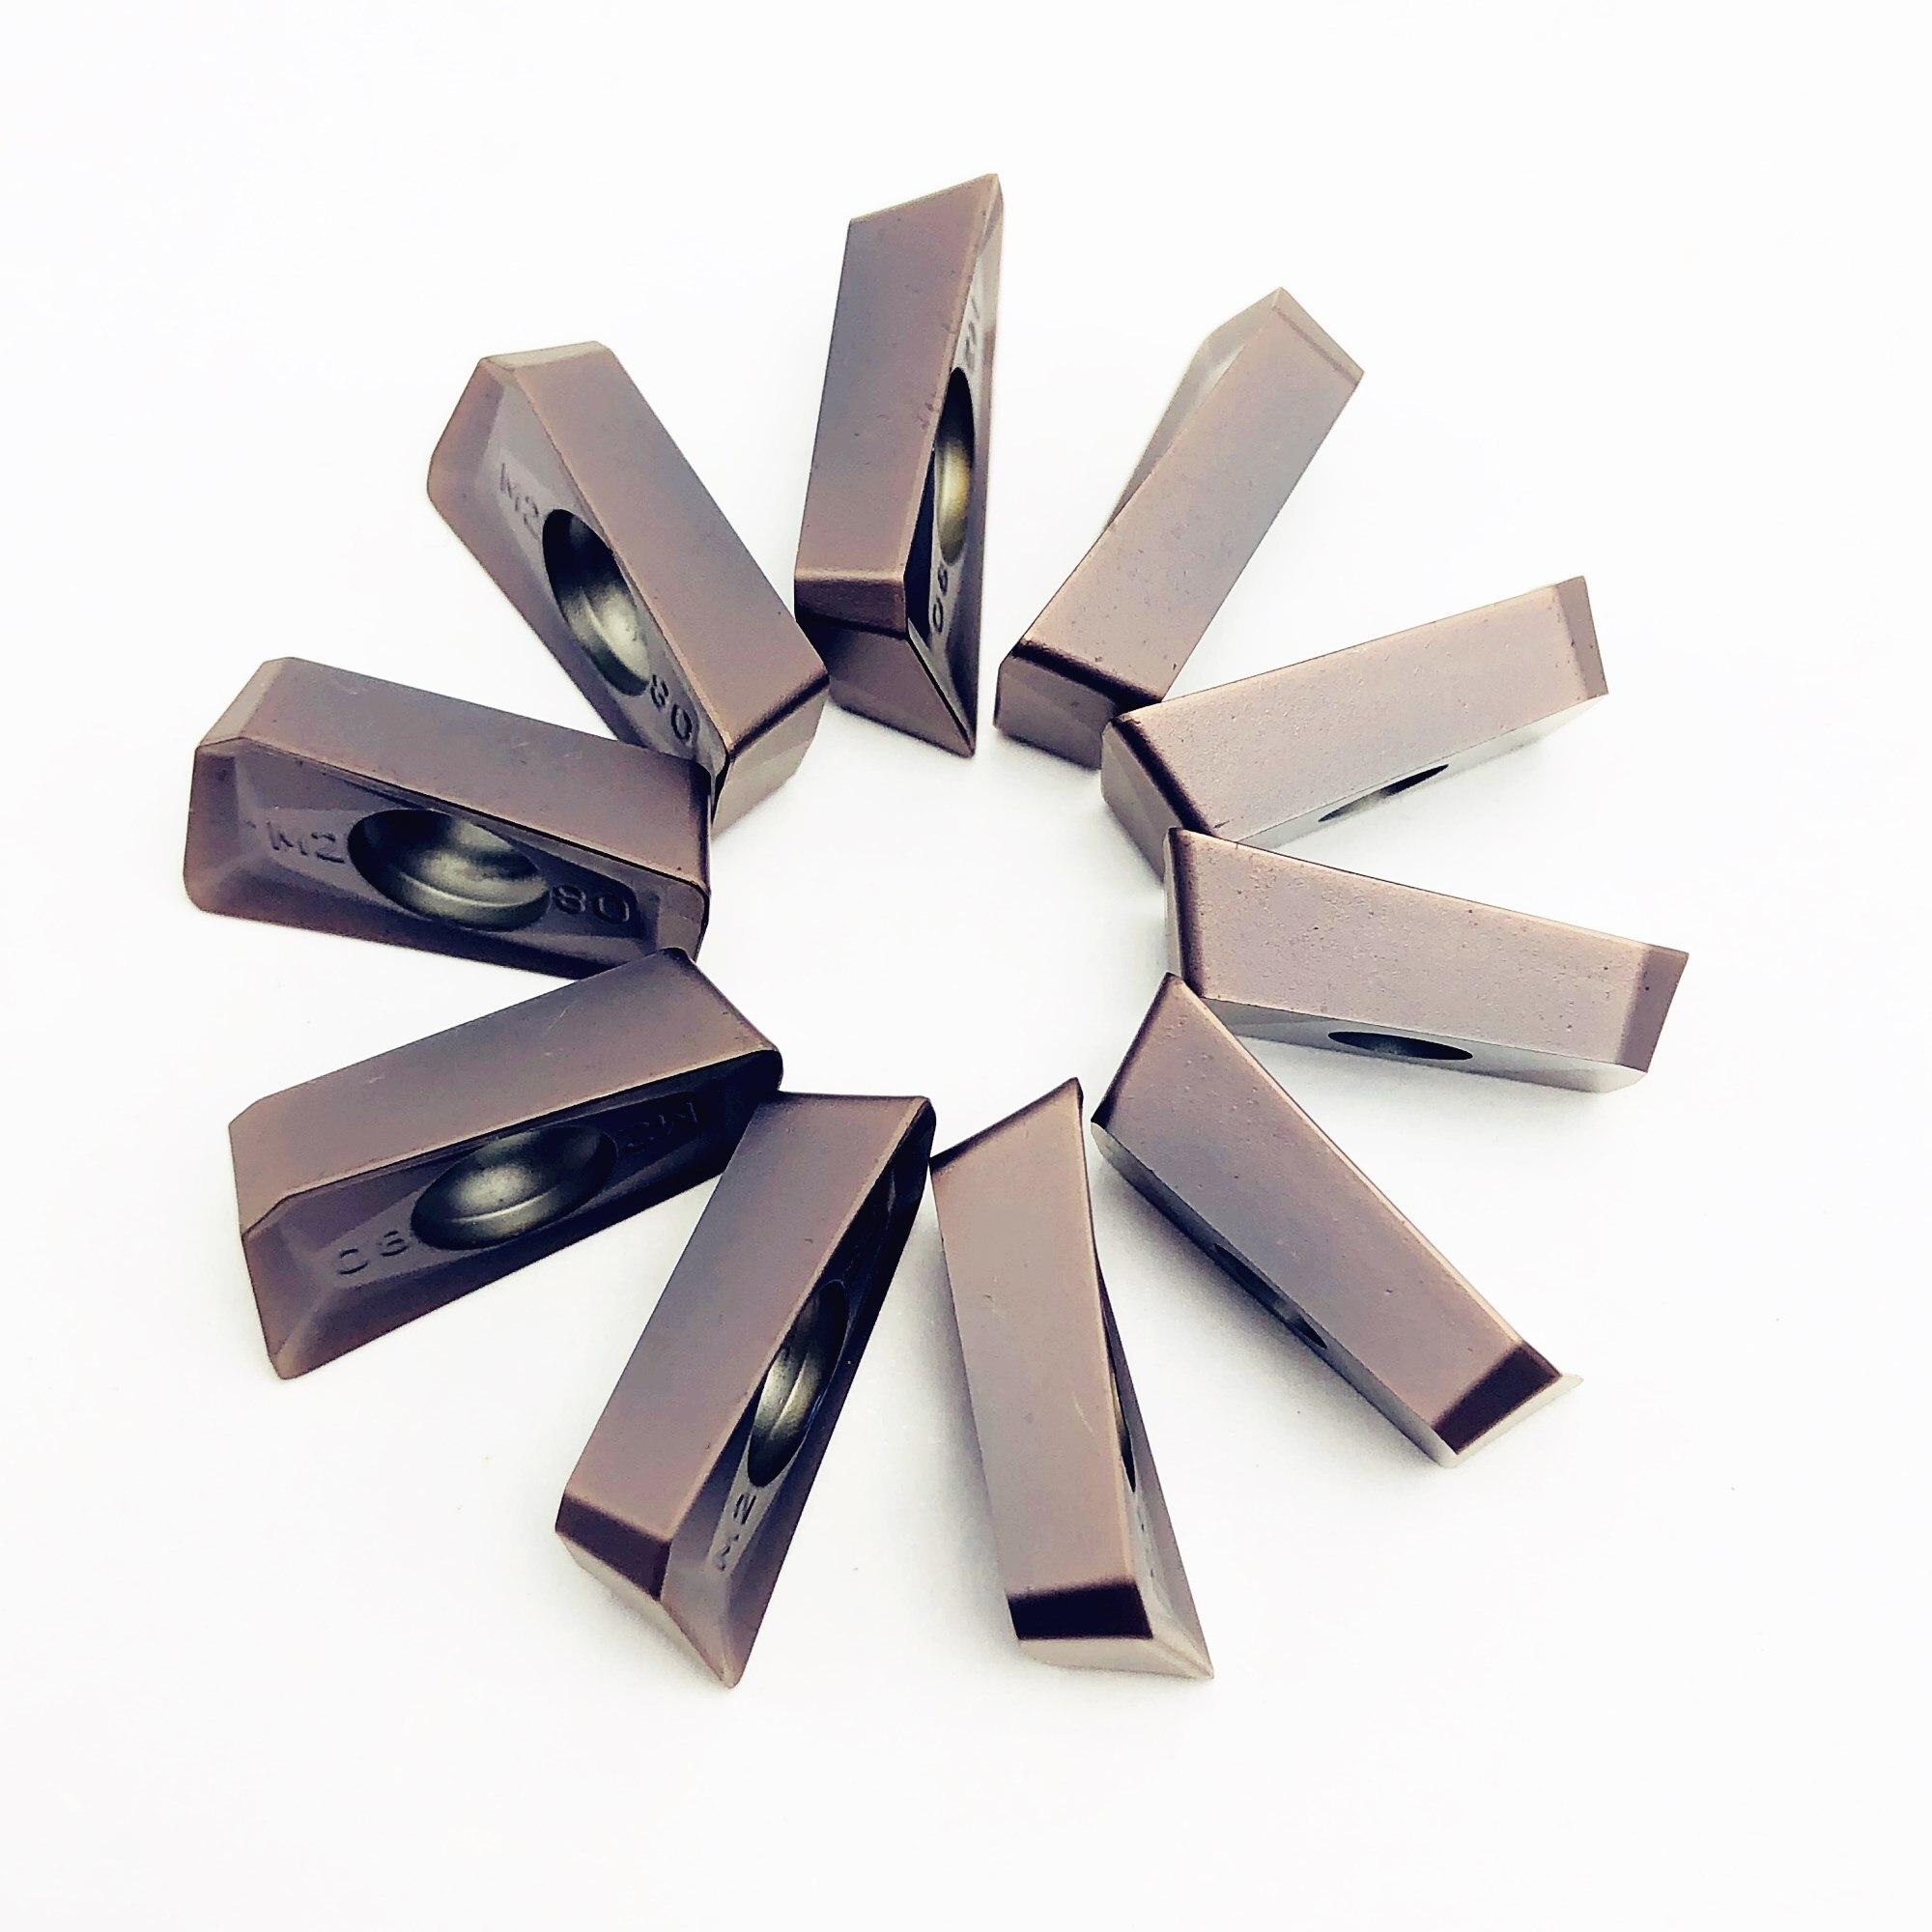 APMT1604 M2 VP15TF Carbide Insert Internal Cutting Tool R0.8 Tungsten Carbide Metal Turning Tools APMT 1604PDER Lathe Tool